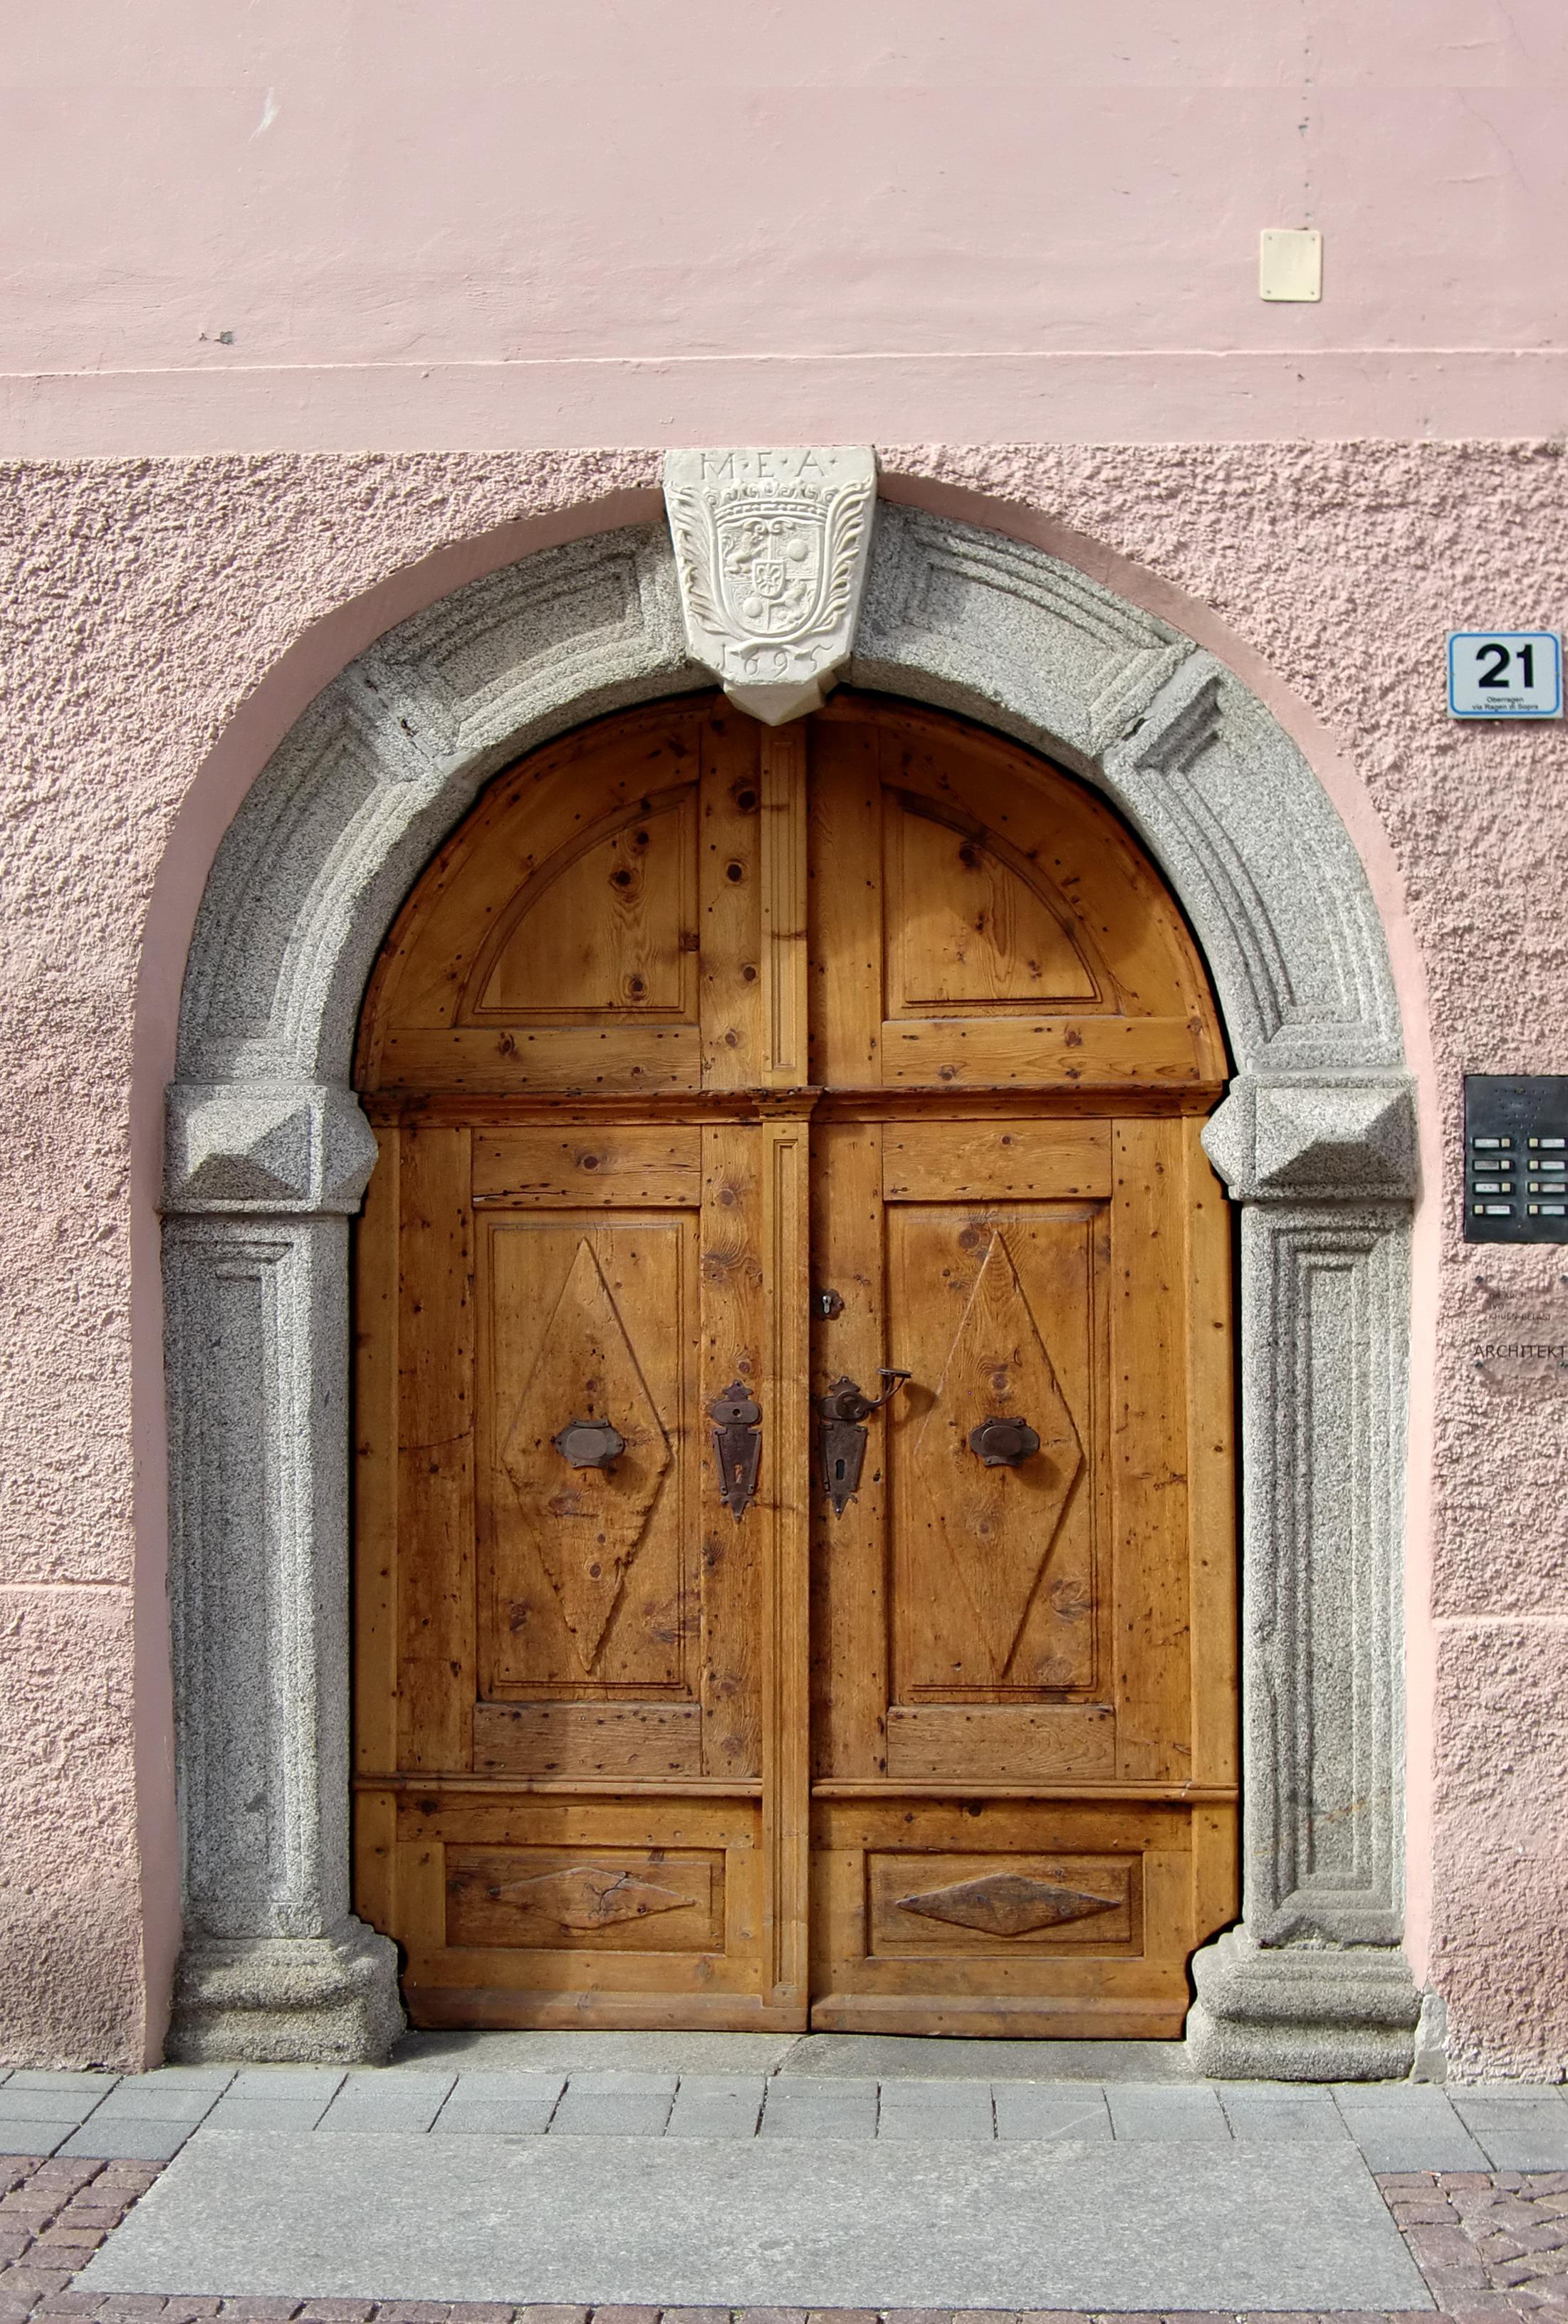 Bildet arkitektur struktur tre vindu vegg bue for Door to gate kontakt